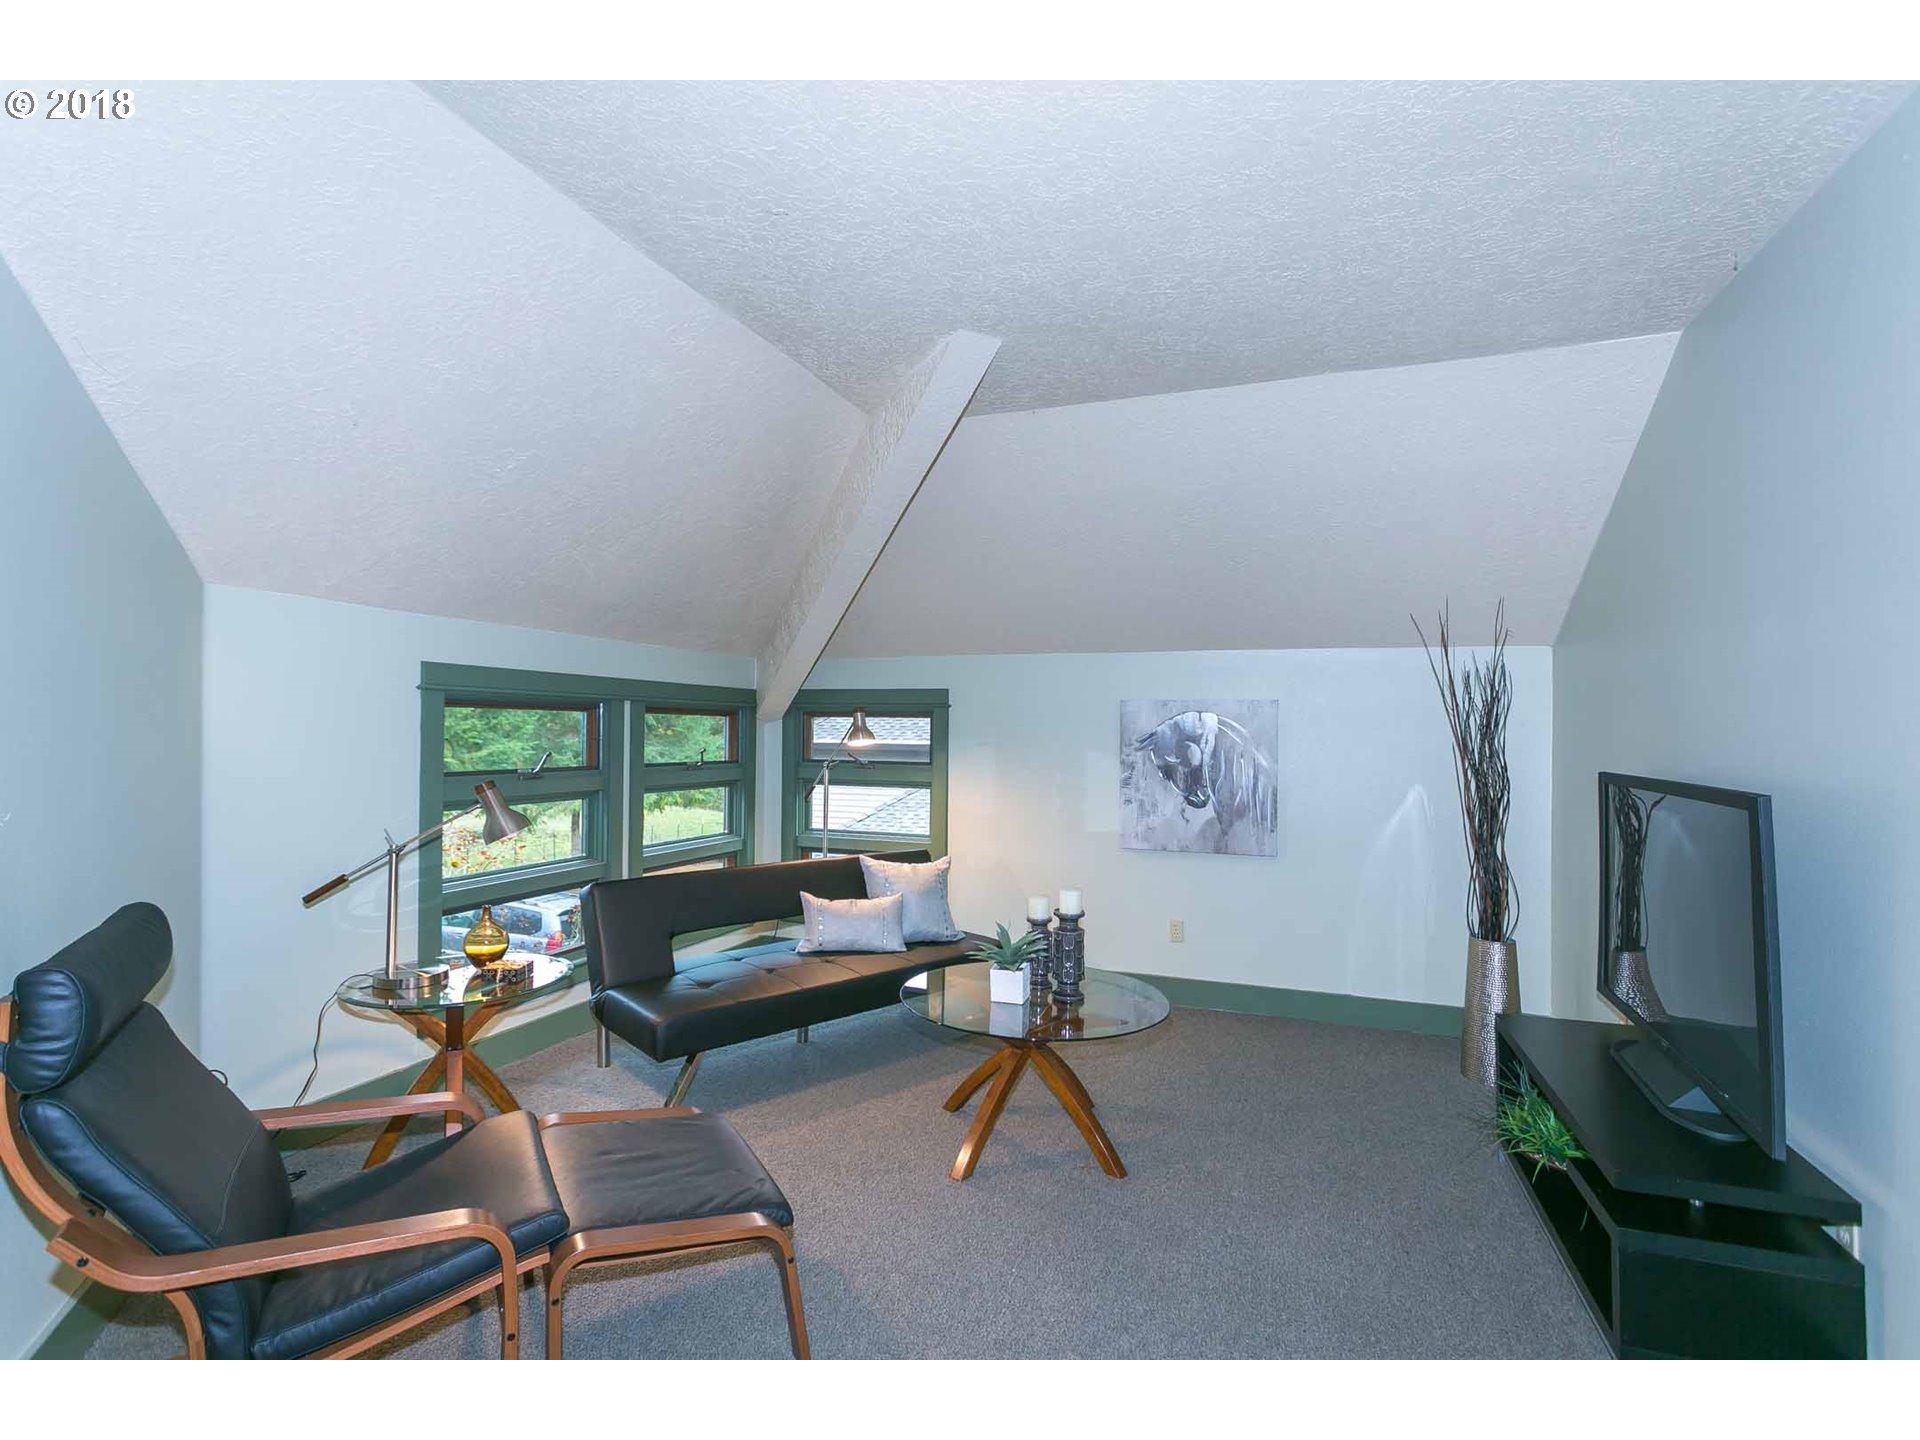 2421 SW VACUNA ST Portland, OR 97219 - MLS #: 18190694